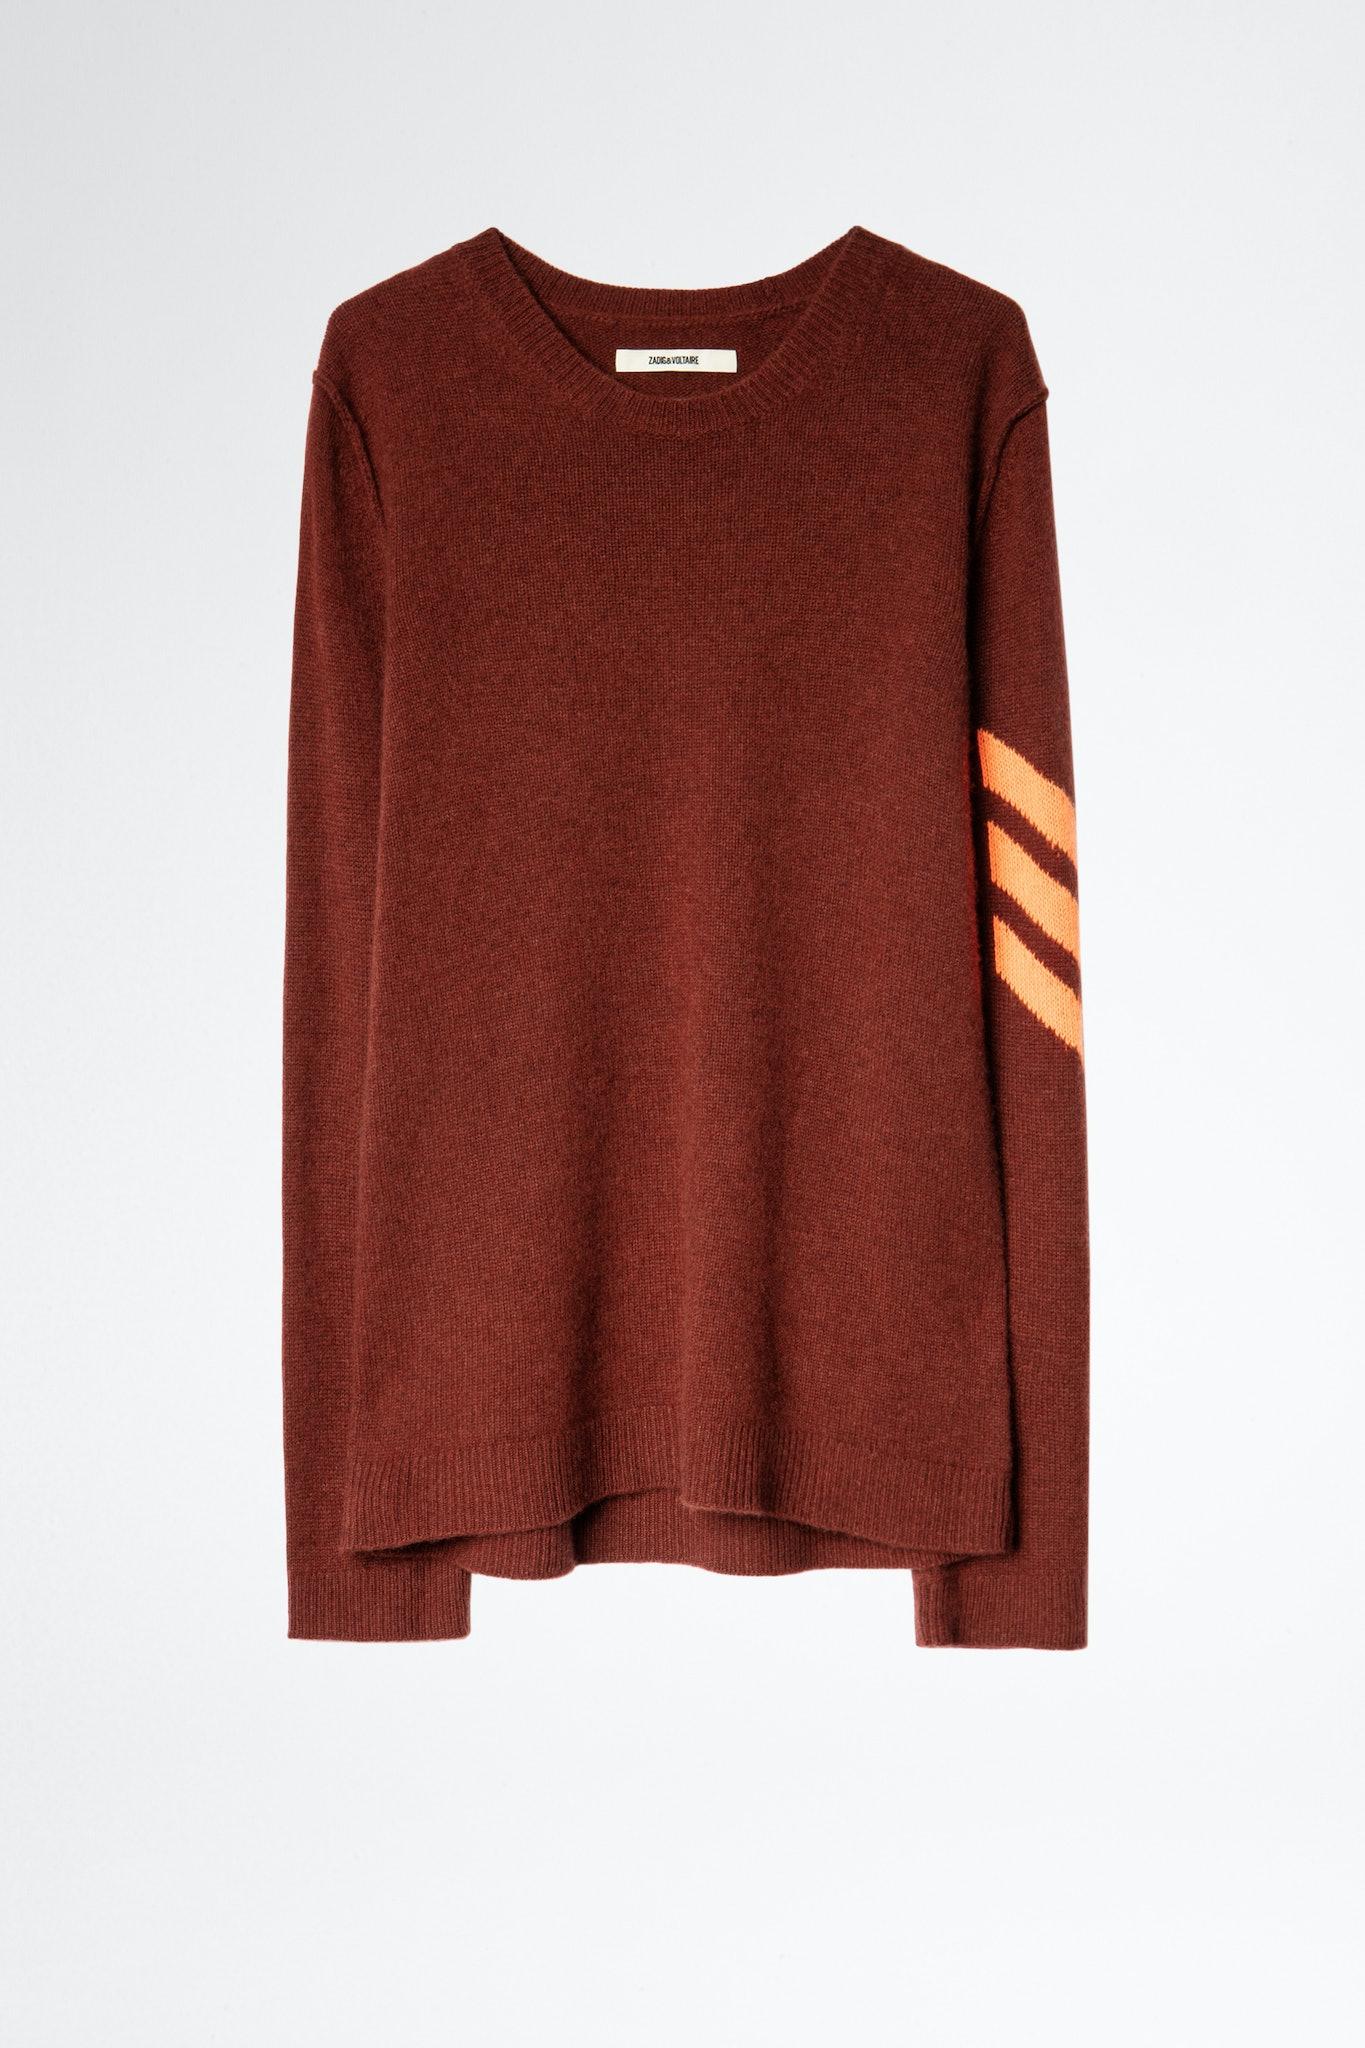 Kennedy Cachemire Sweater